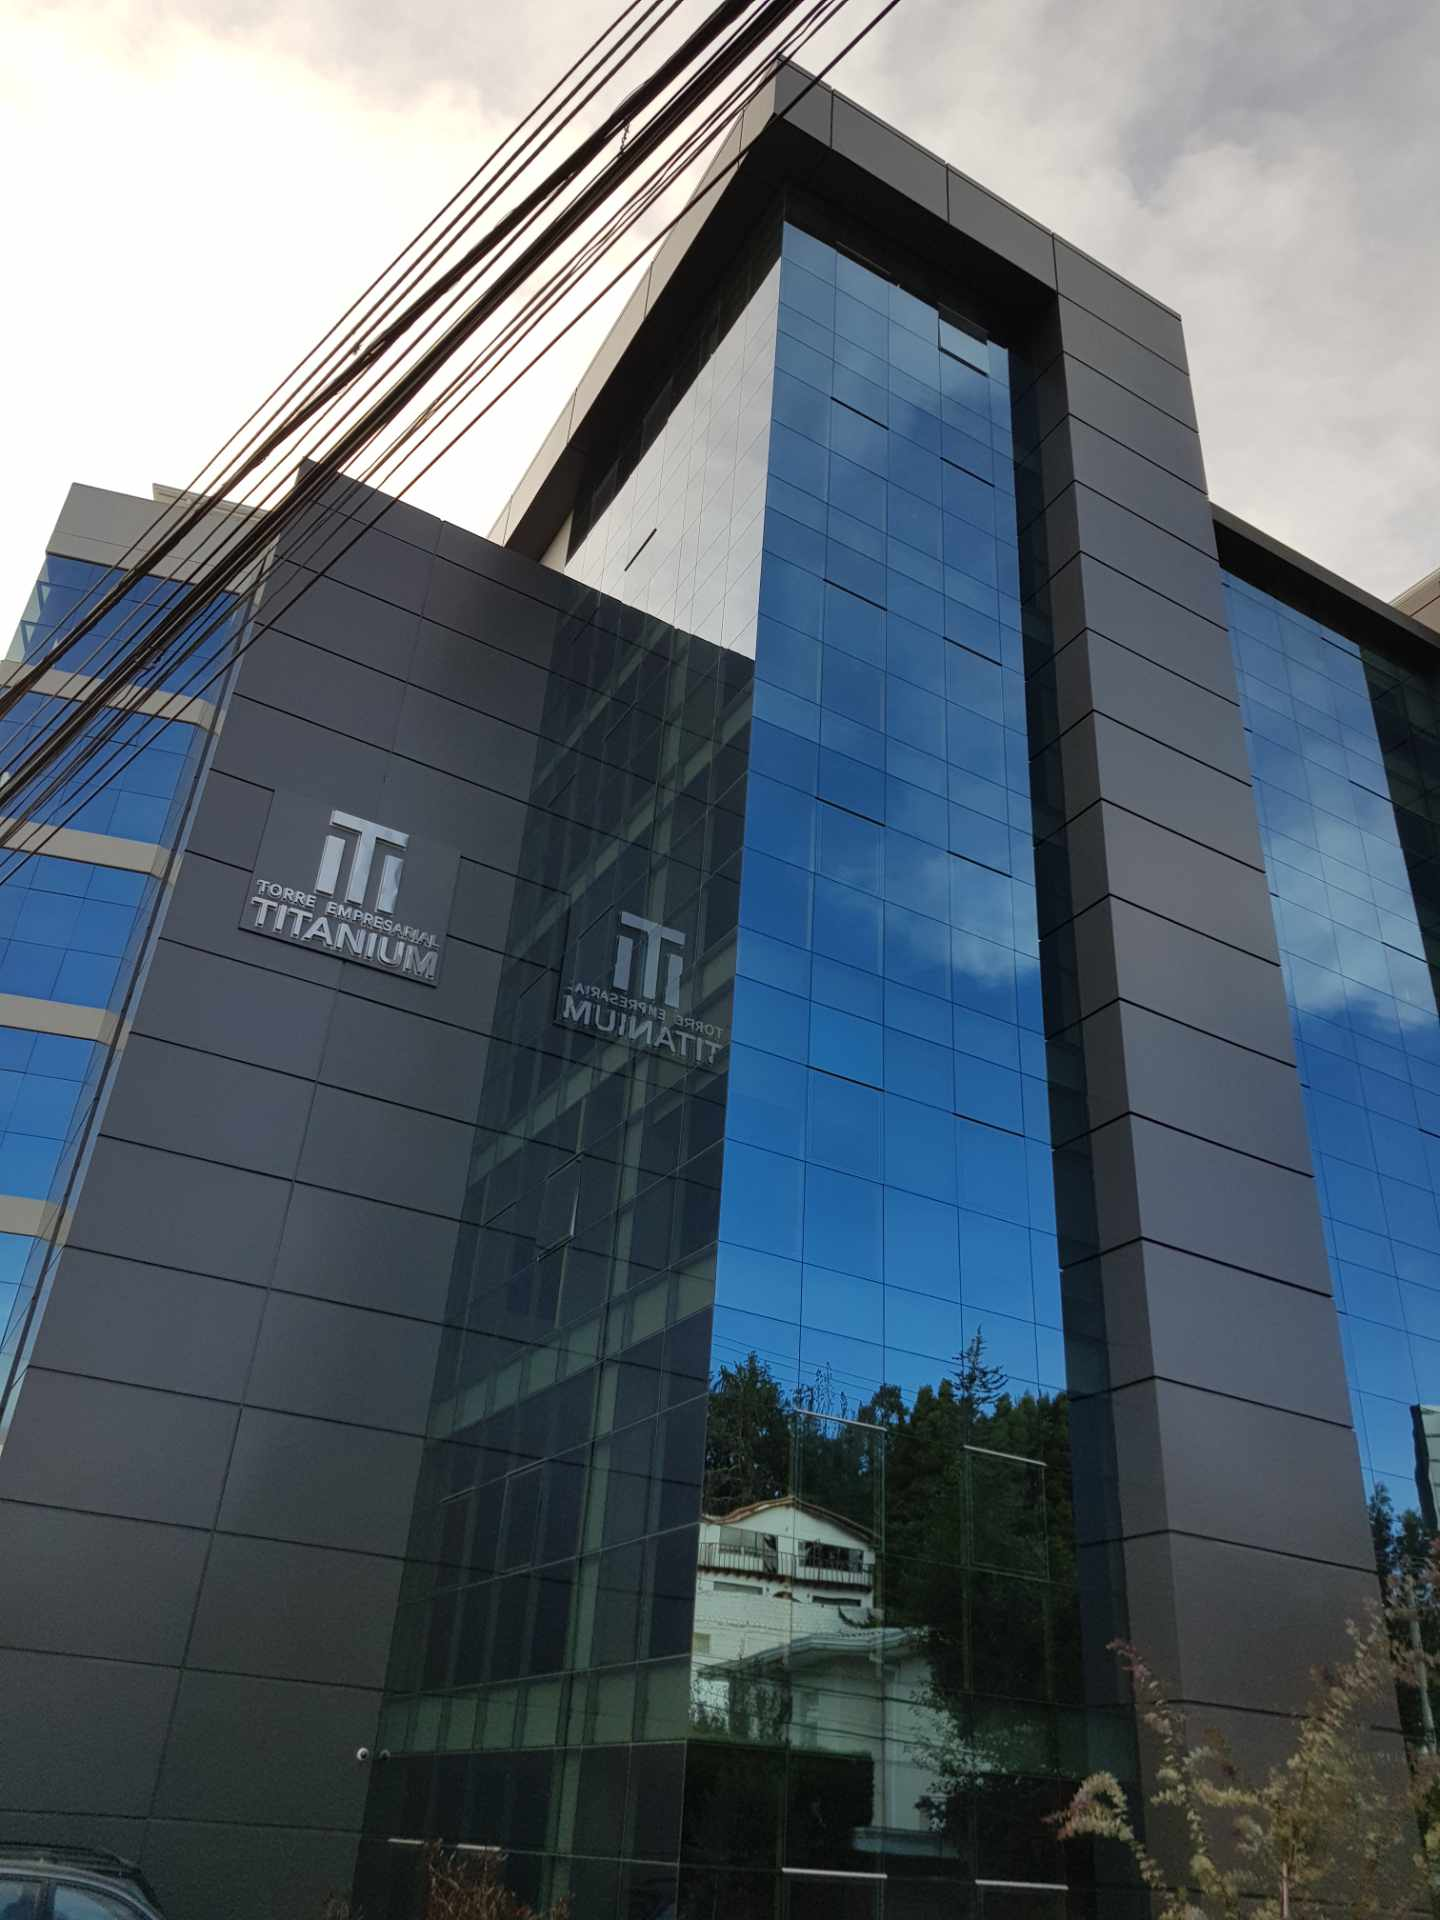 Oficina en Venta Calacoto calle 22 Edificio Torre Empresarial Titanium Foto 1